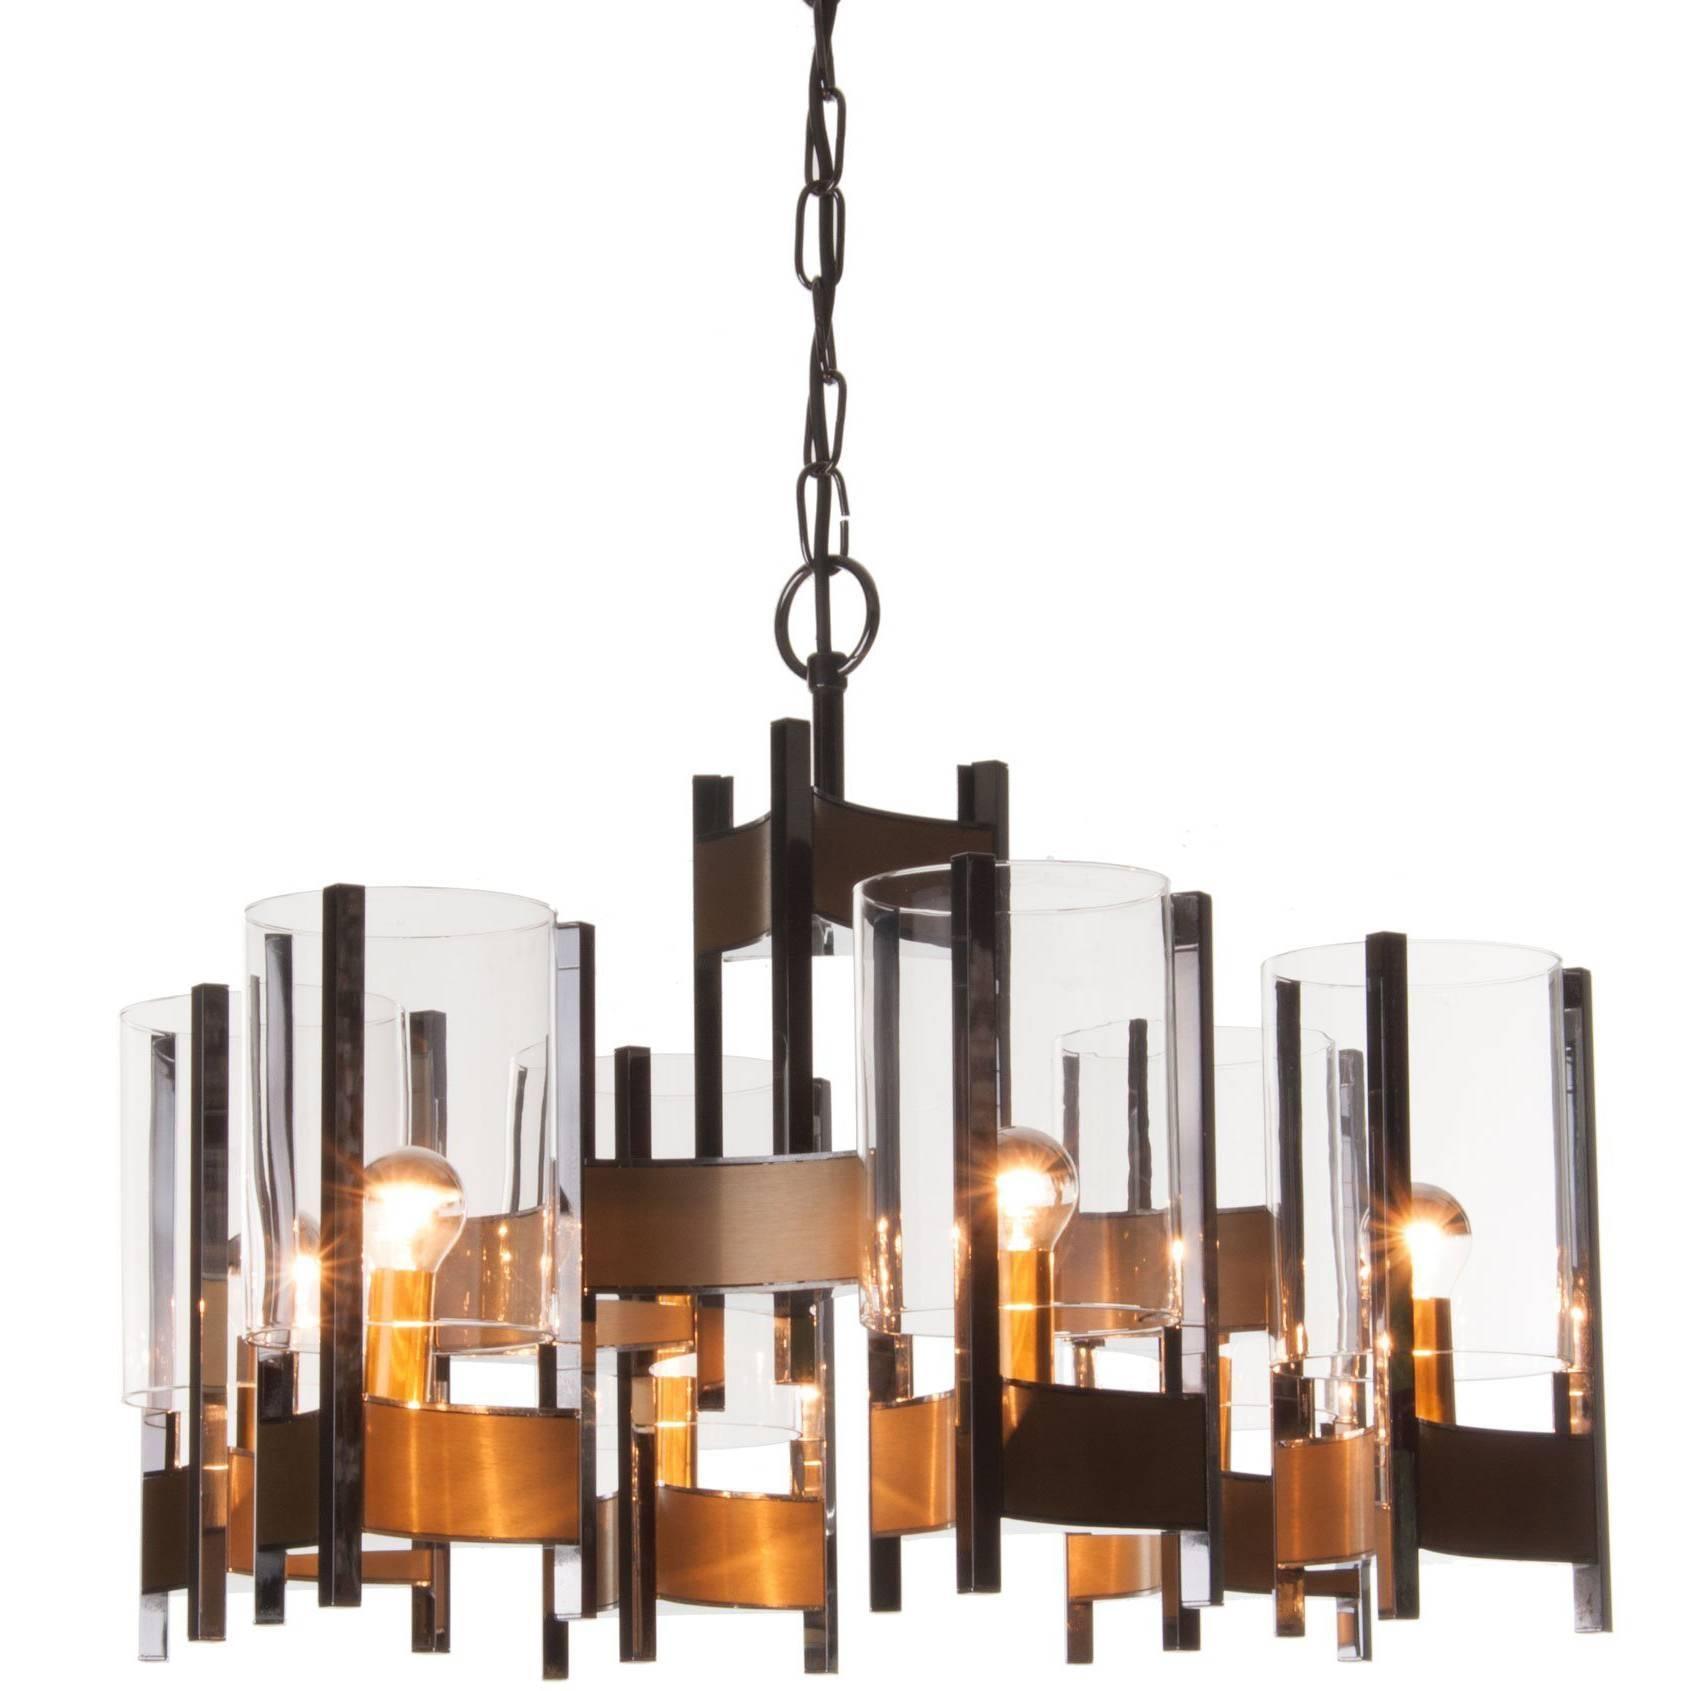 1960s Six-Light Chrome and Glass Chandelier by Gaetano Sciolari